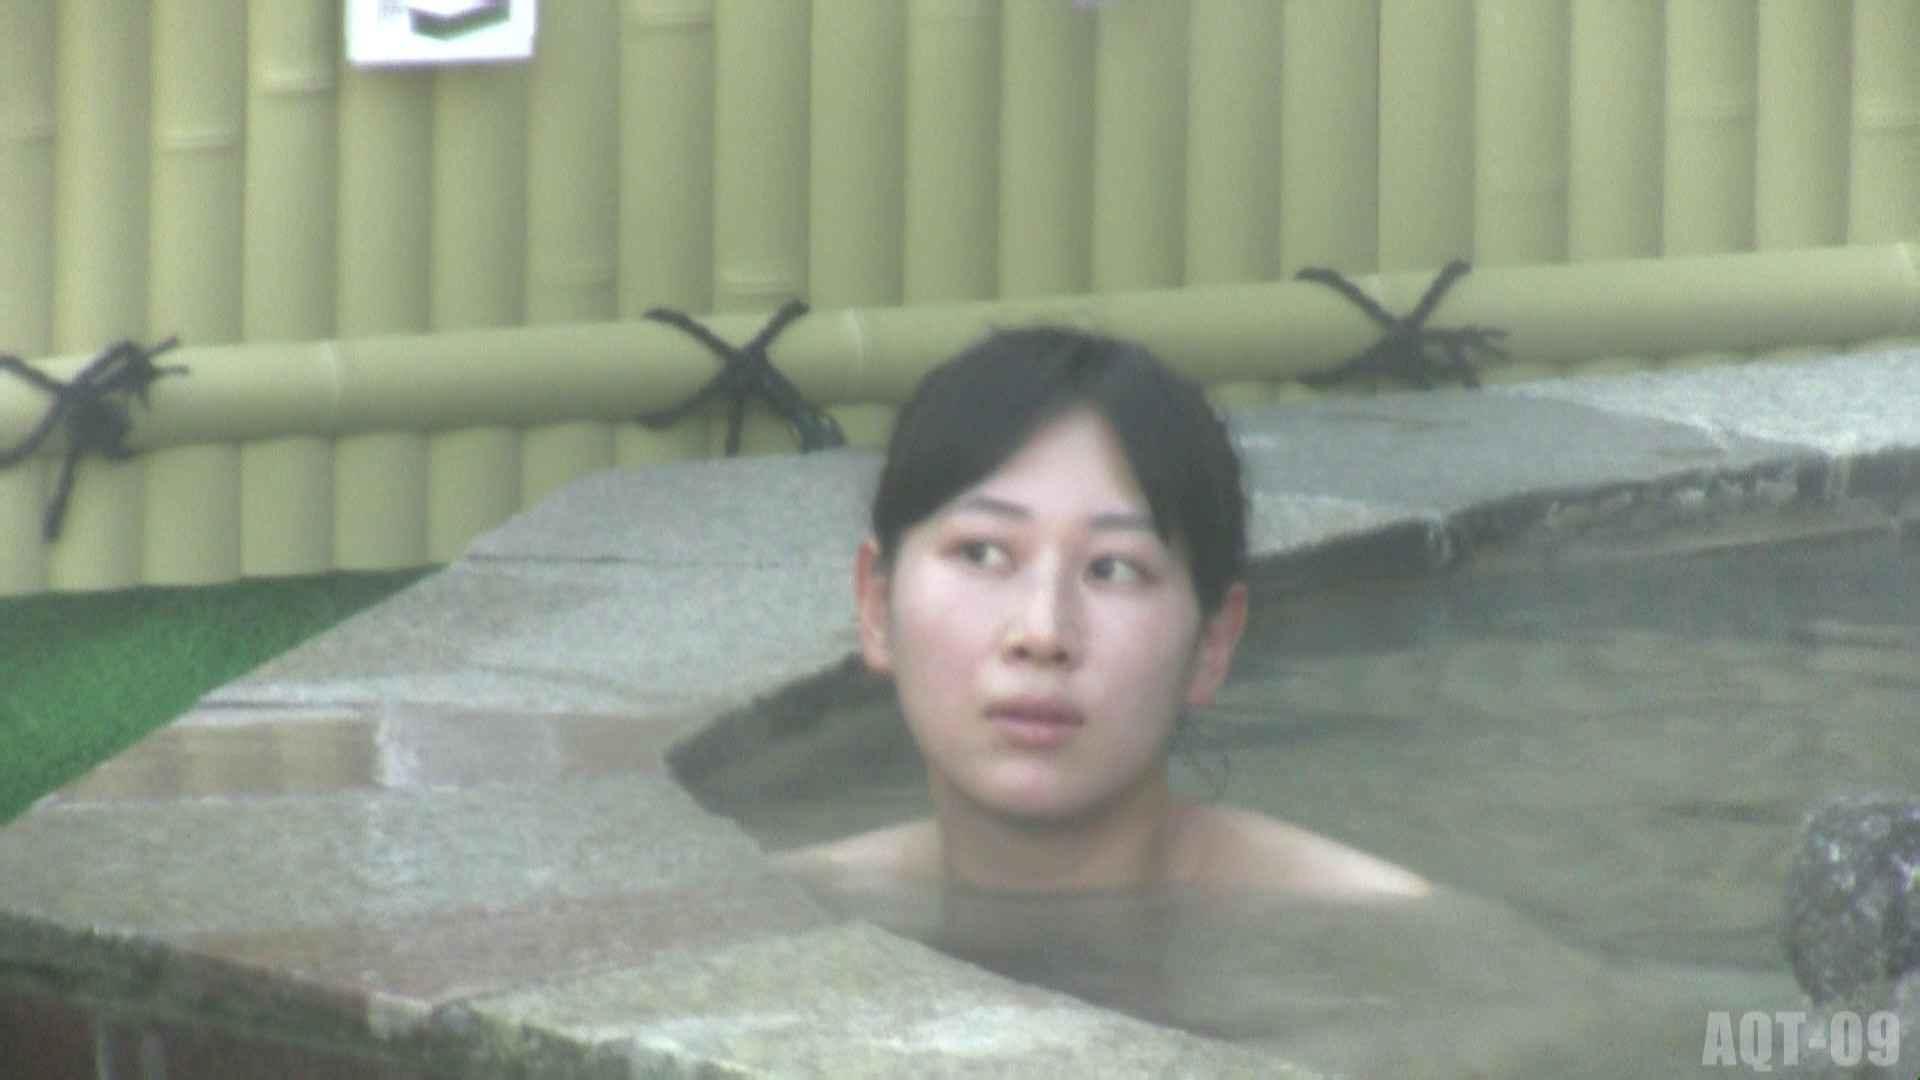 Aquaな露天風呂Vol.785 盗撮師作品 オメコ無修正動画無料 84pic 77